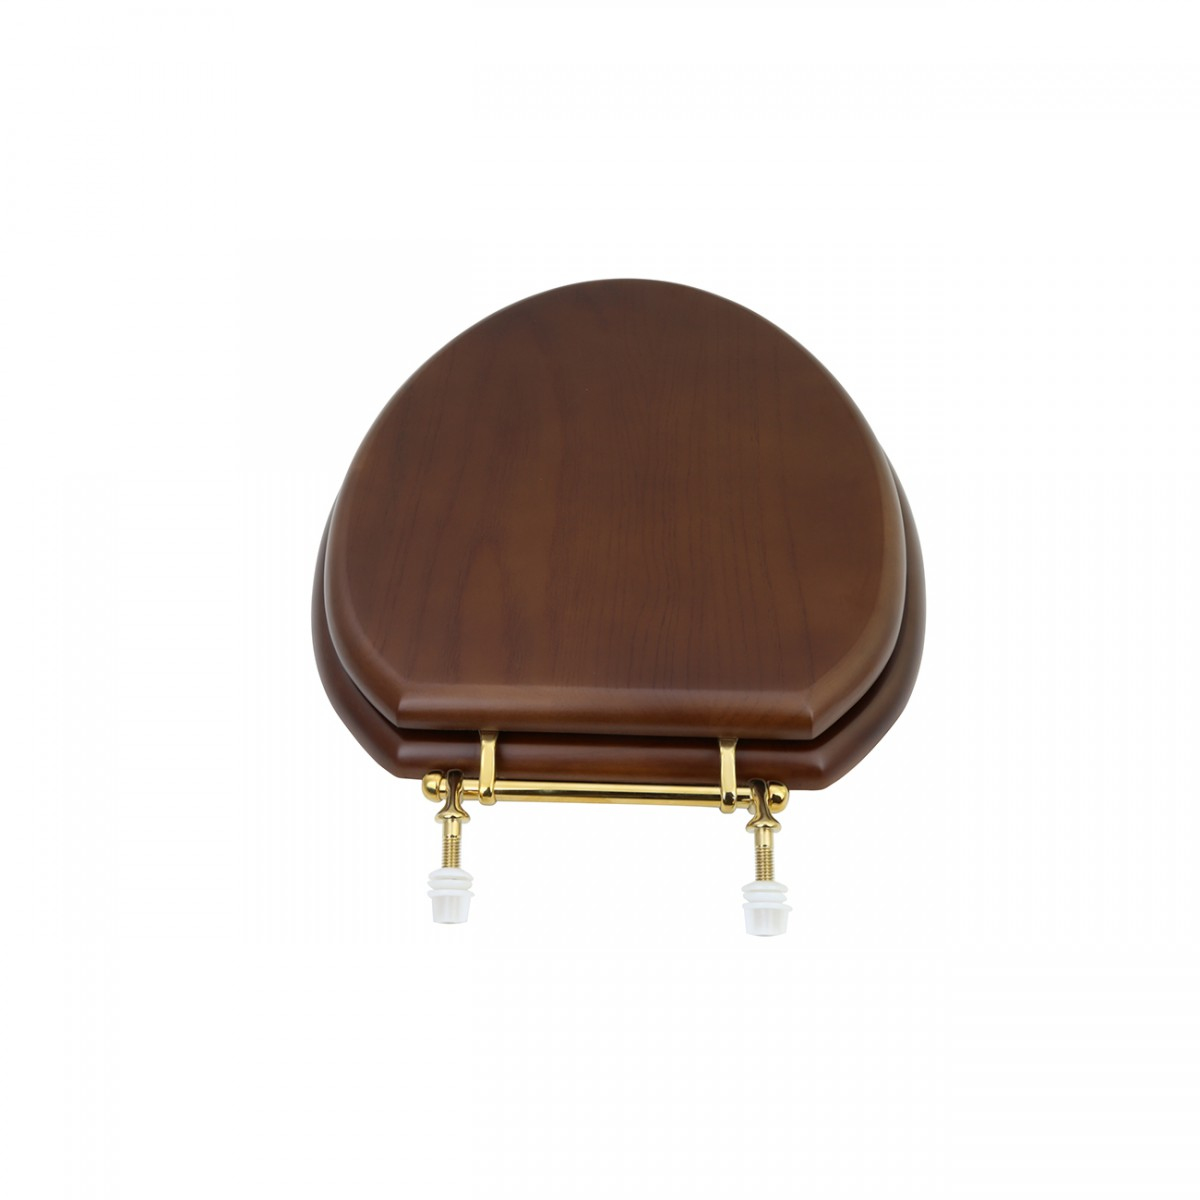 Toilet Seat Elongated Solid Wood Dark Oak Brass Hinge wooden toilet seats wood toilet seats wood toilet seat